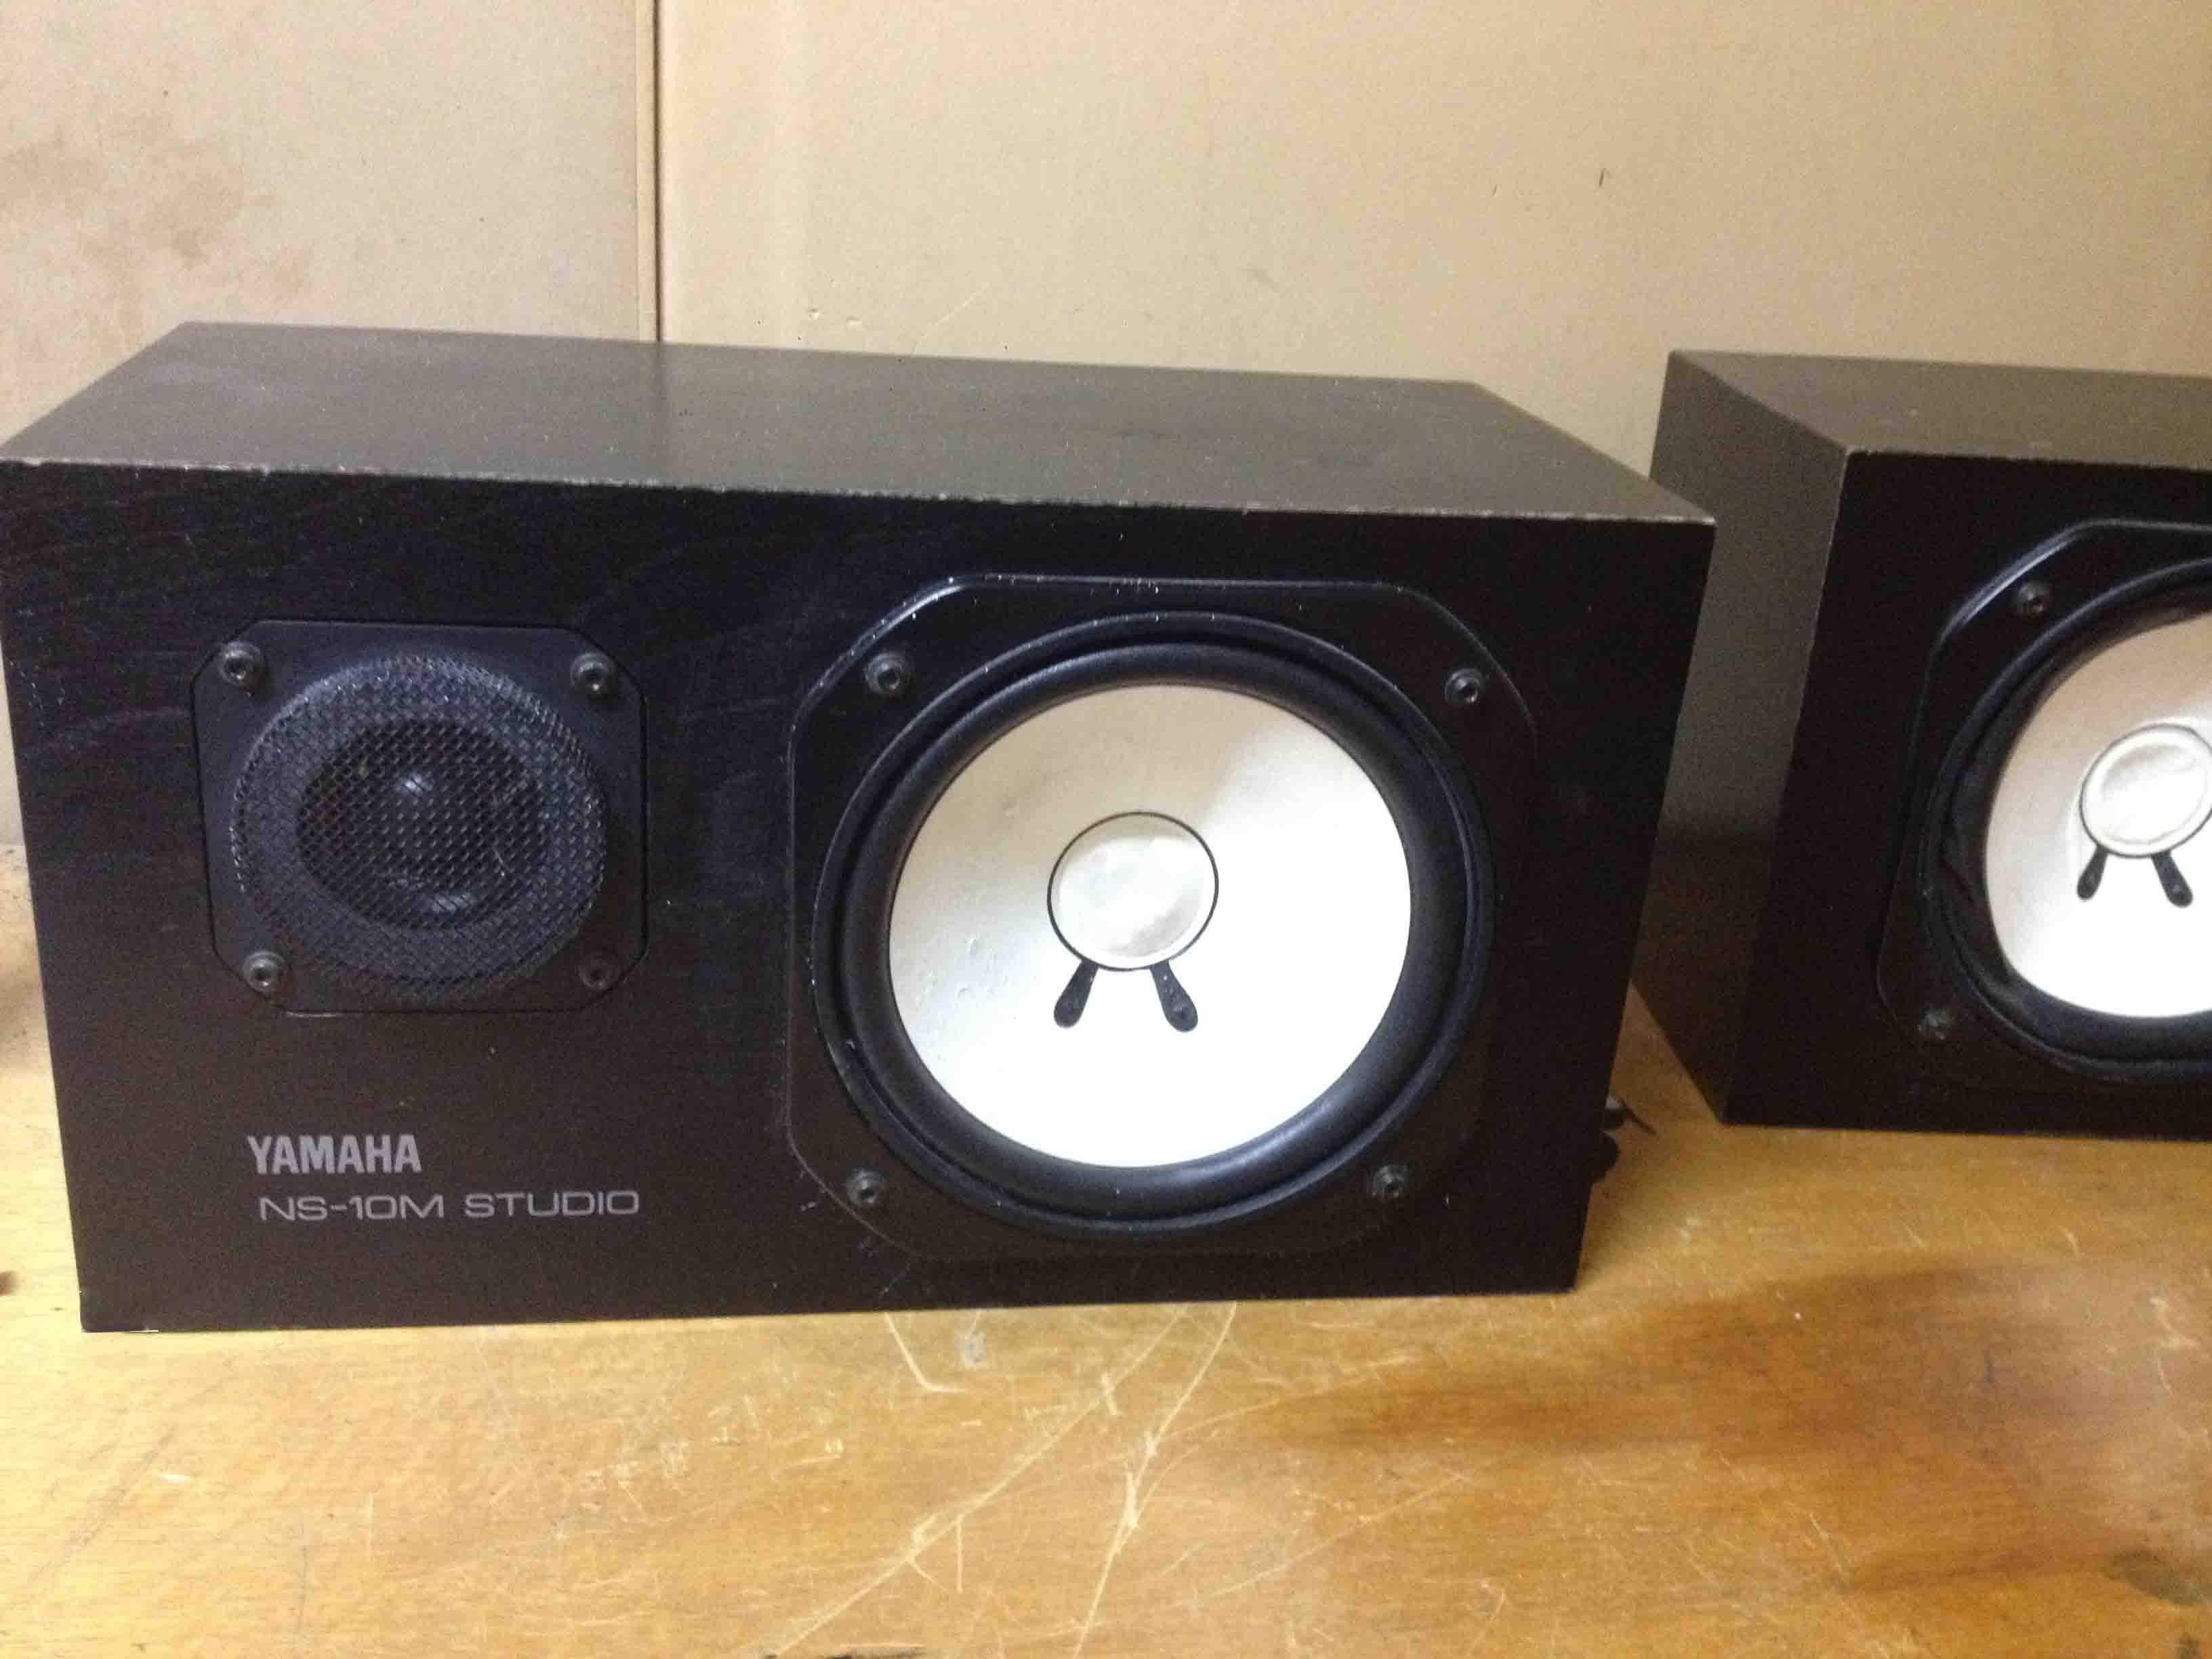 yamaha ns 10m studio image 918119 audiofanzine. Black Bedroom Furniture Sets. Home Design Ideas